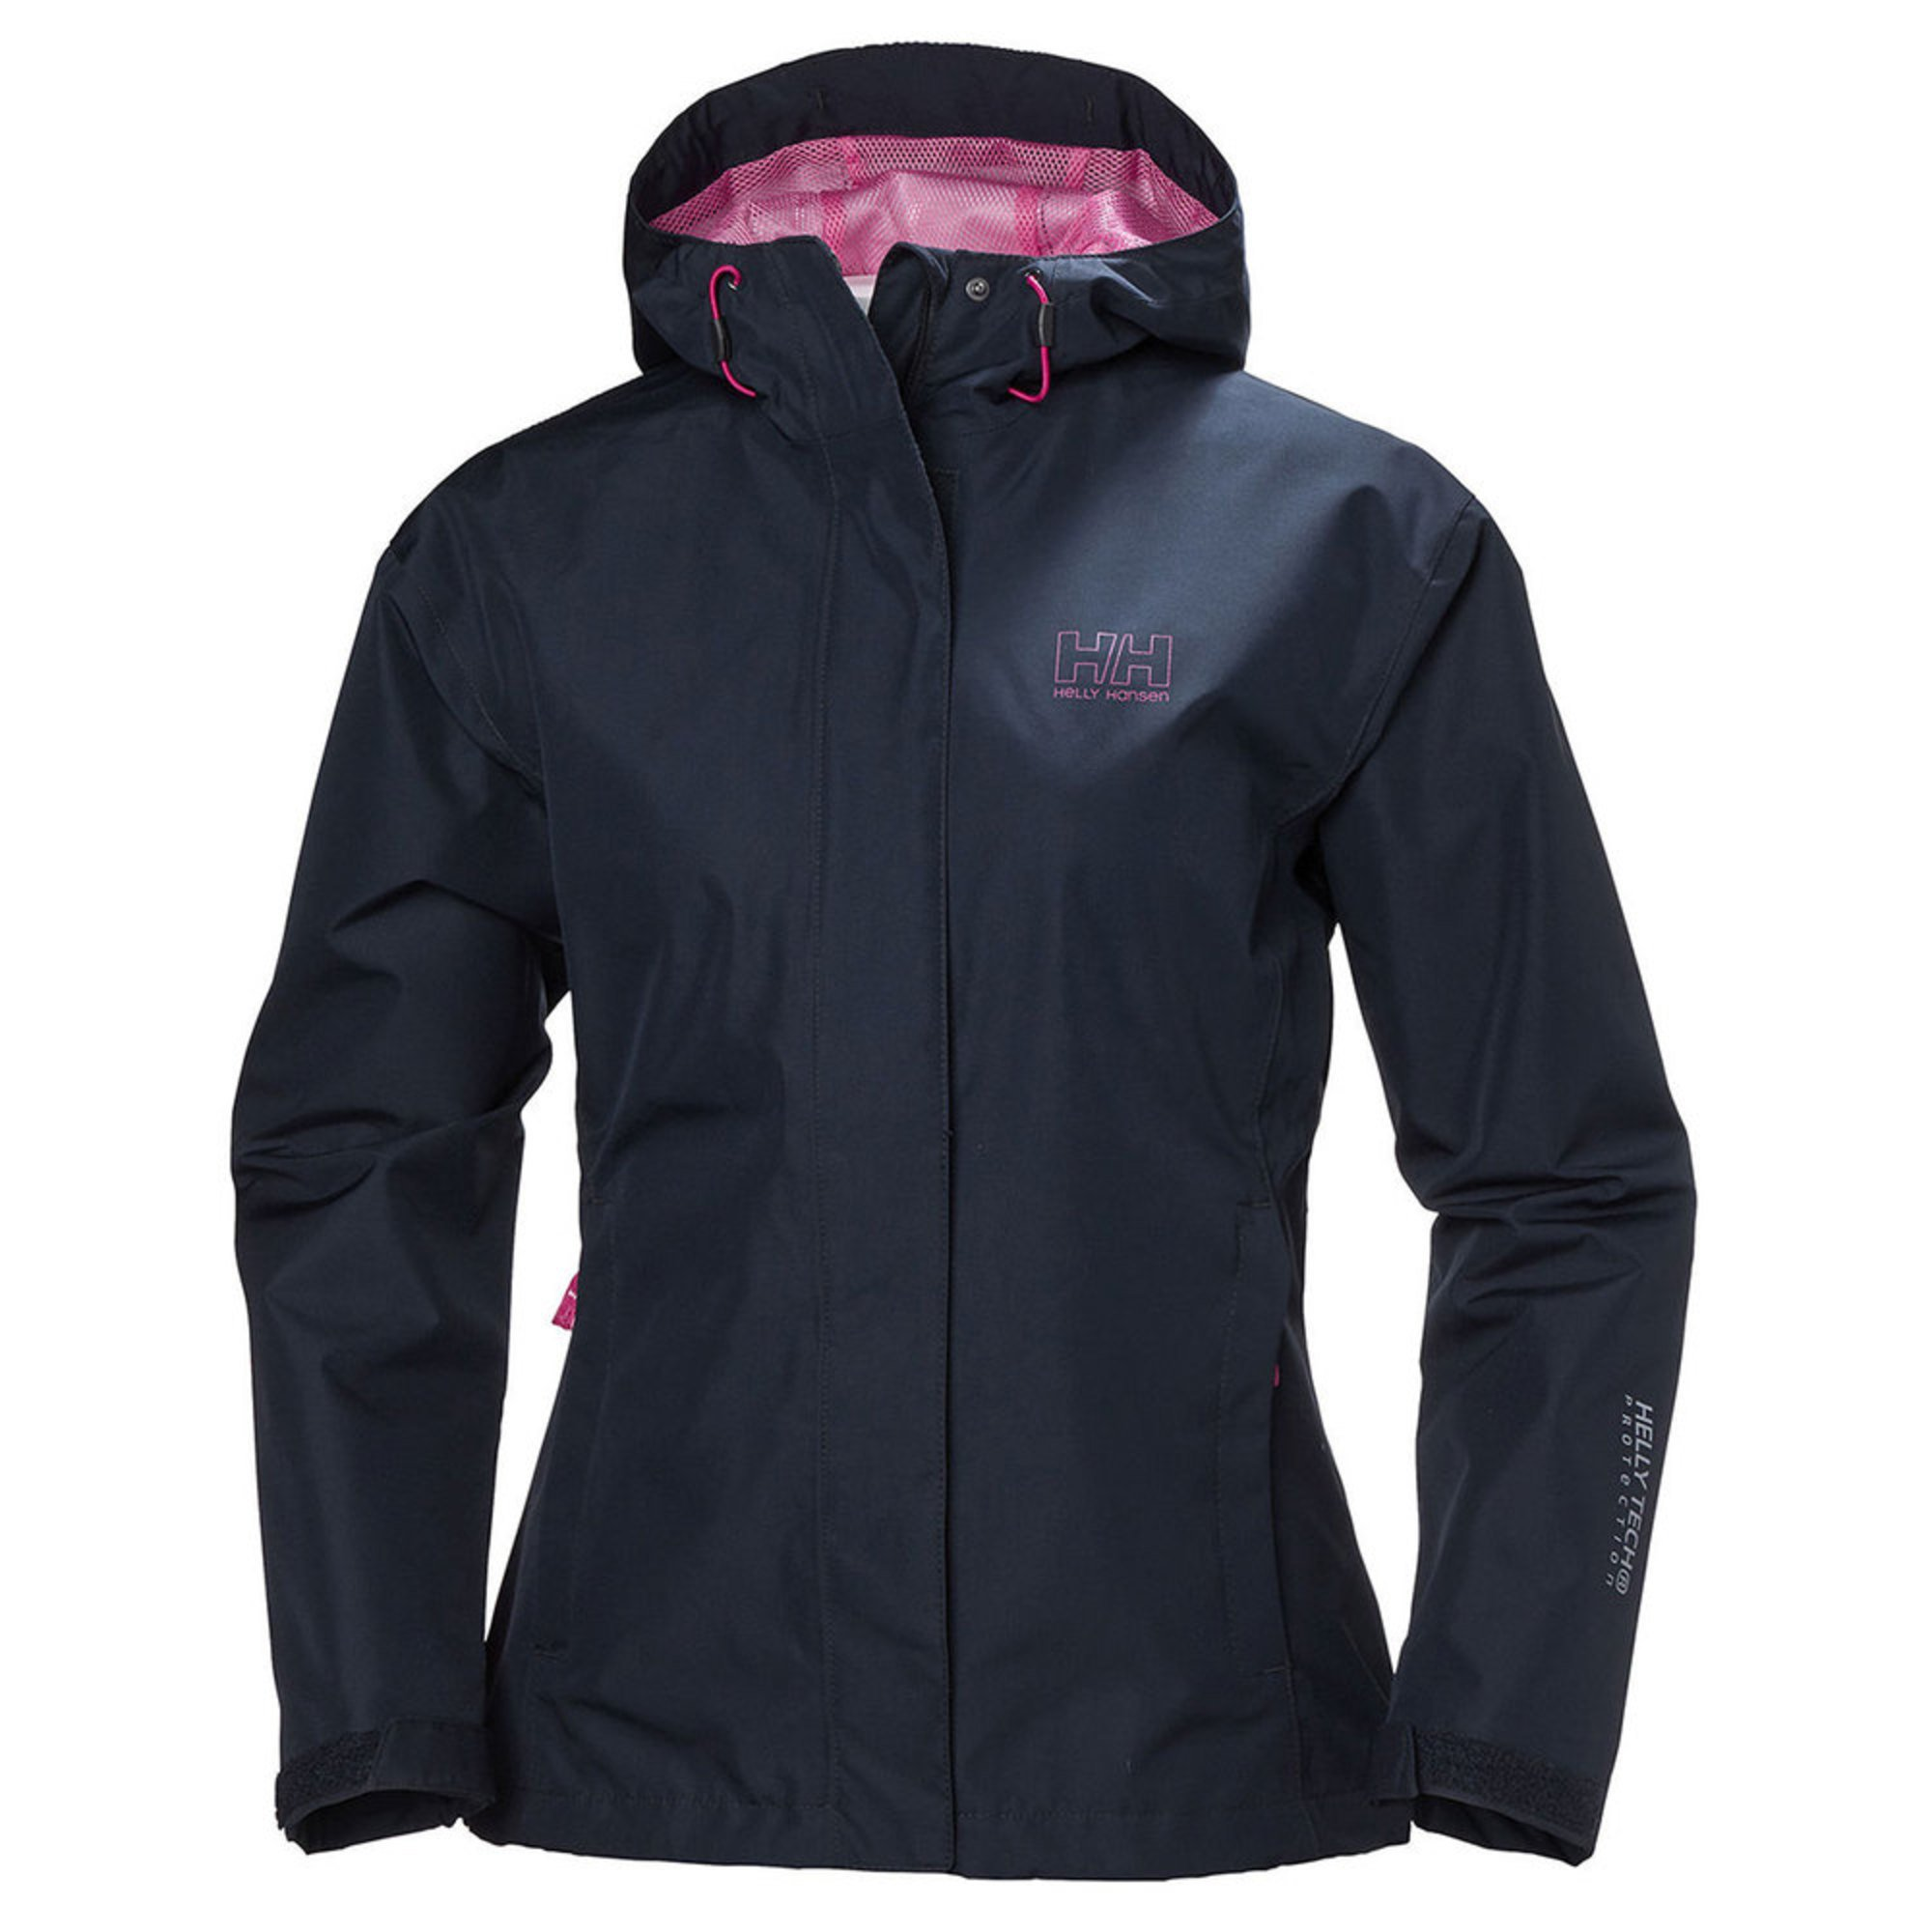 1cc5caab6 Helly Hansen Women's Seven Jacket   Outdoor Jackets & Coats ...